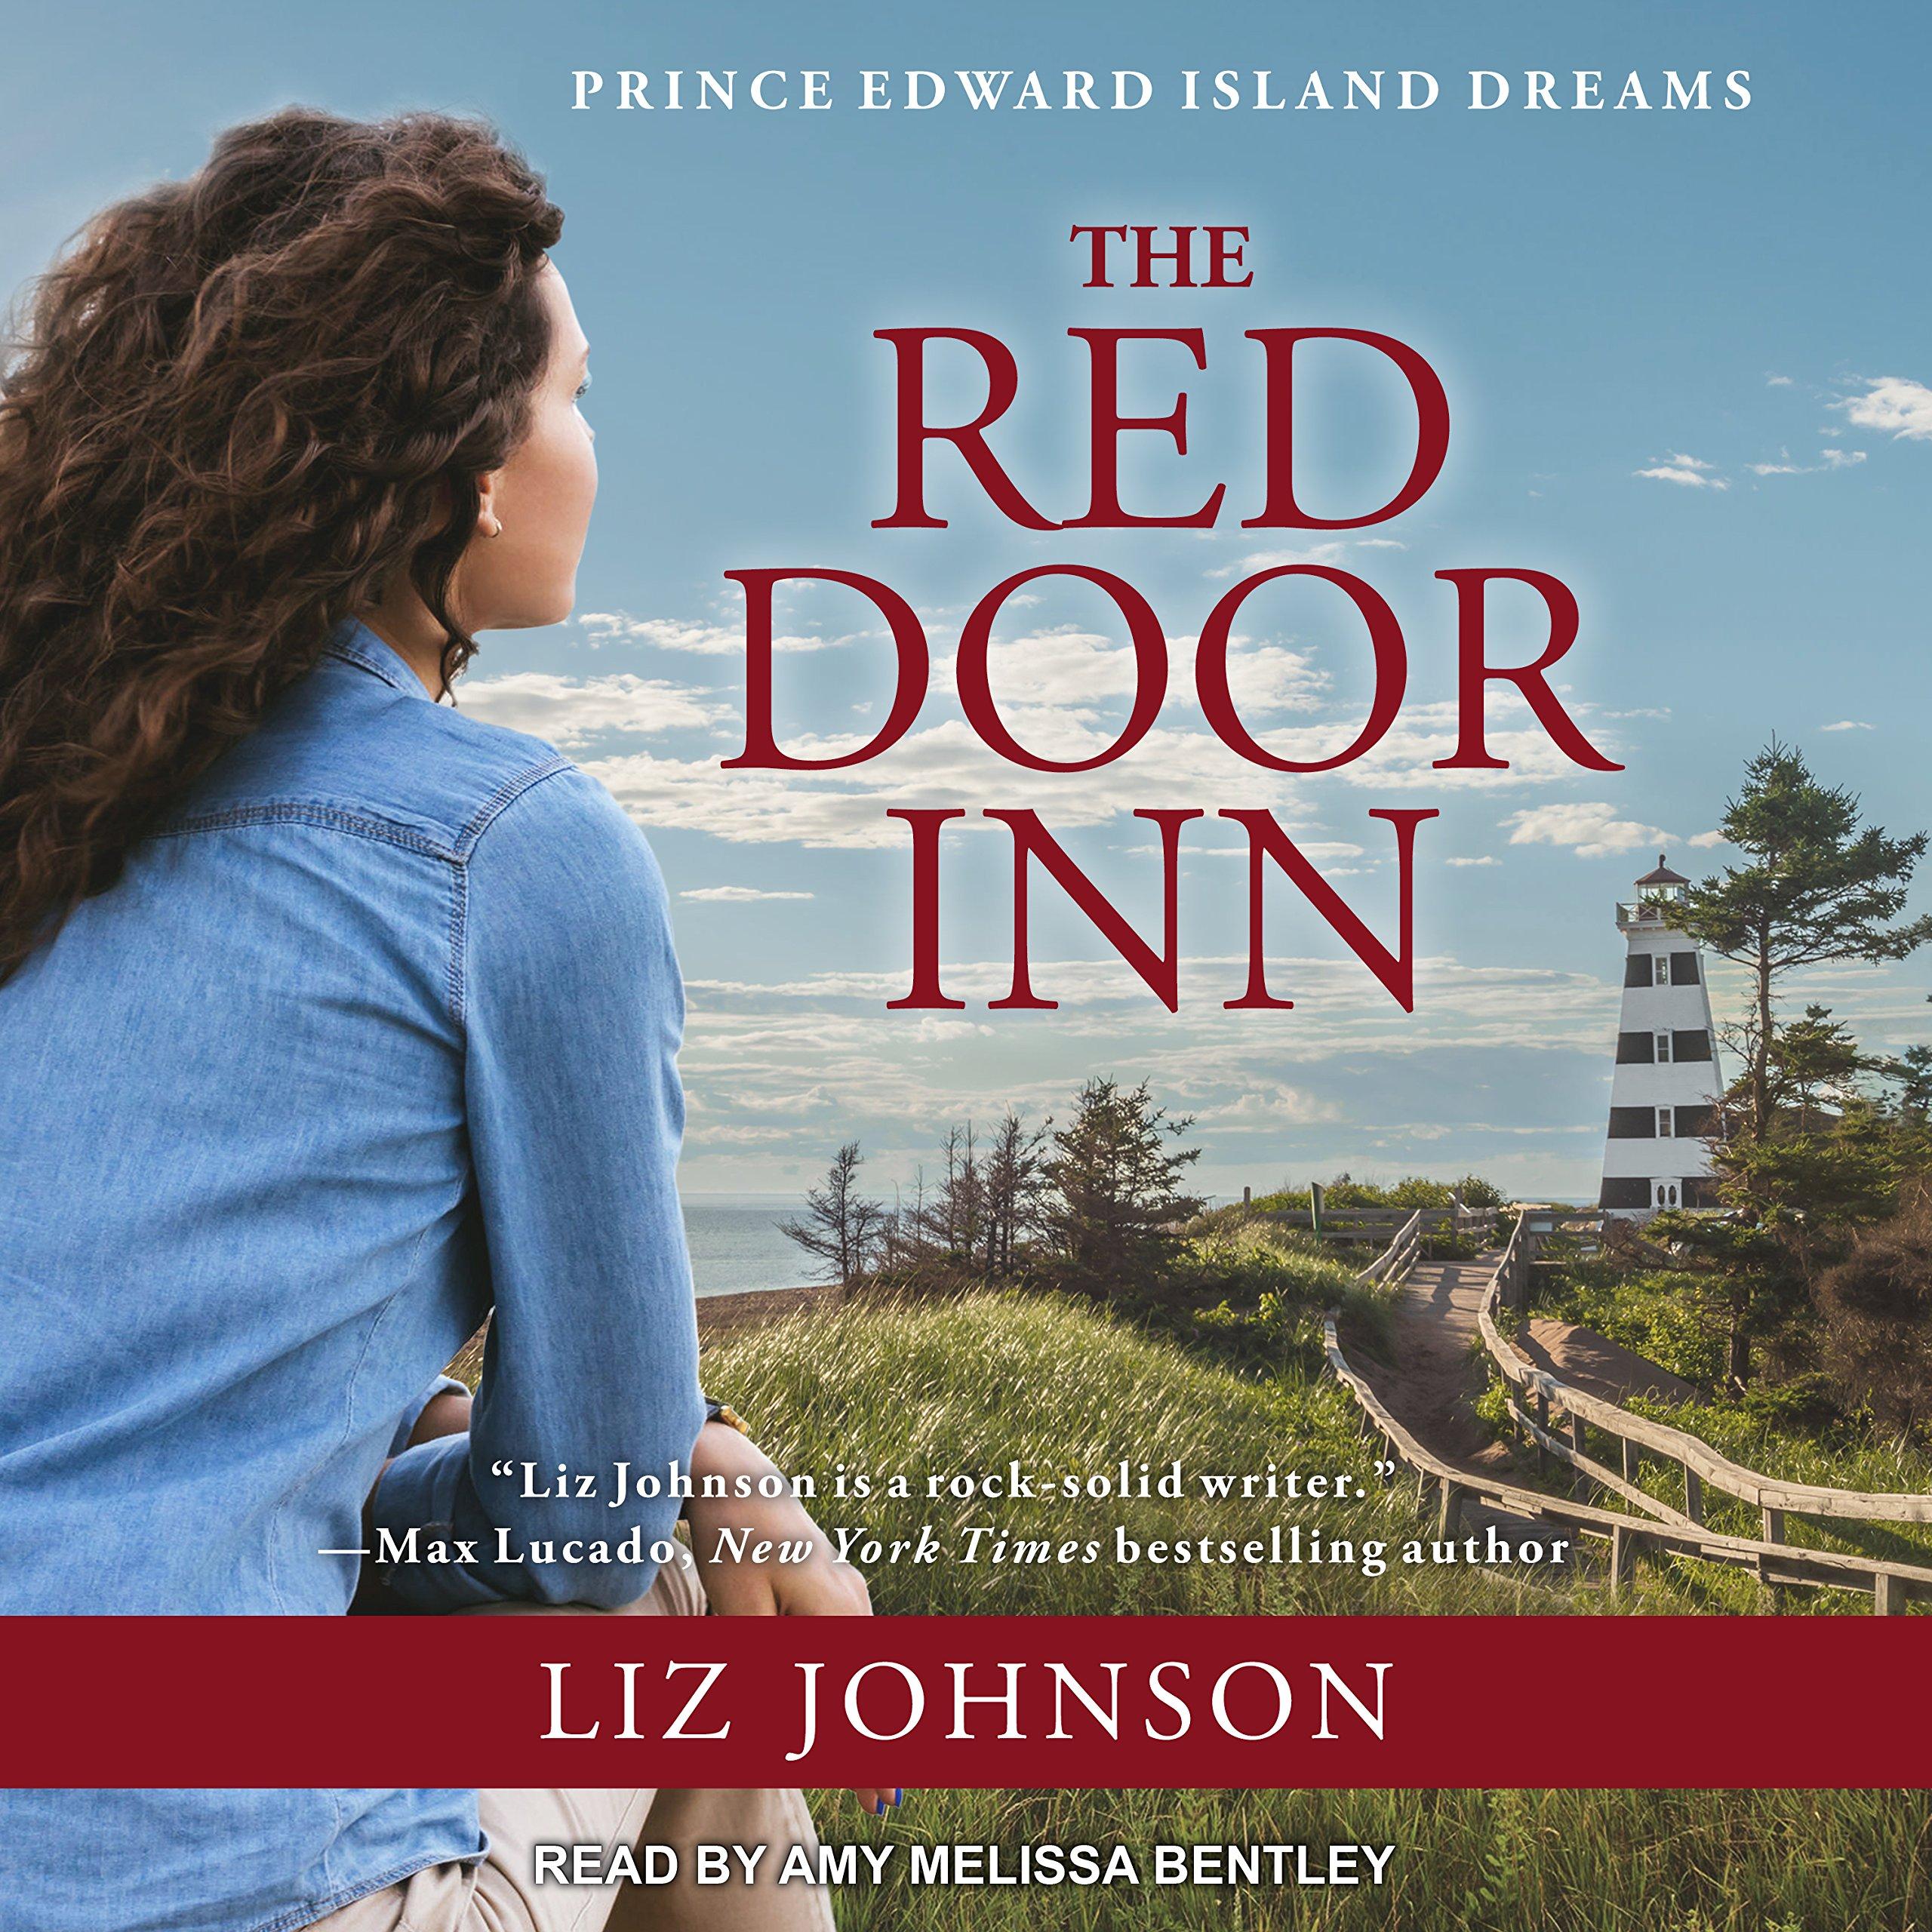 The Red Door Inn Amazon Liz Johnson Amy Melissa Bentley Books